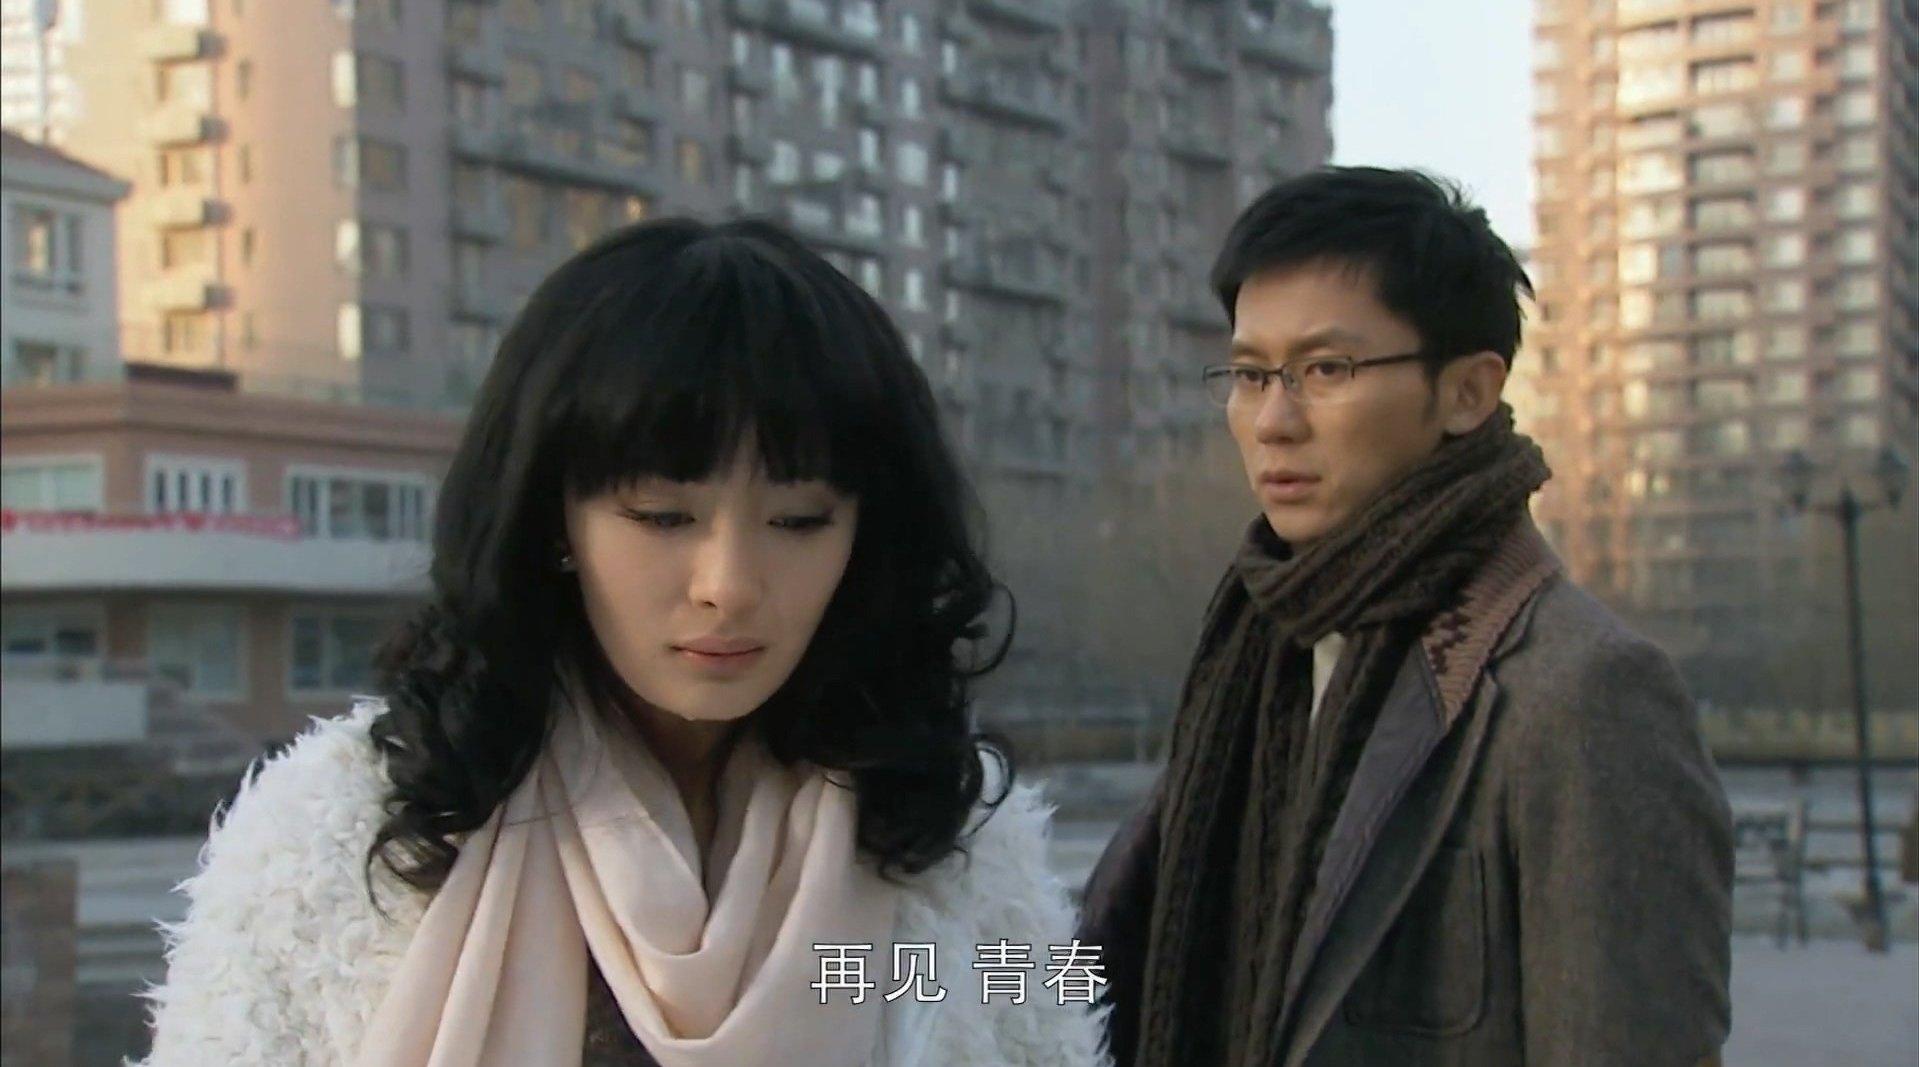 Day76  《北京爱情故事》杨幂杨紫曦cut第13集 重头戏前篇看完再睡吧